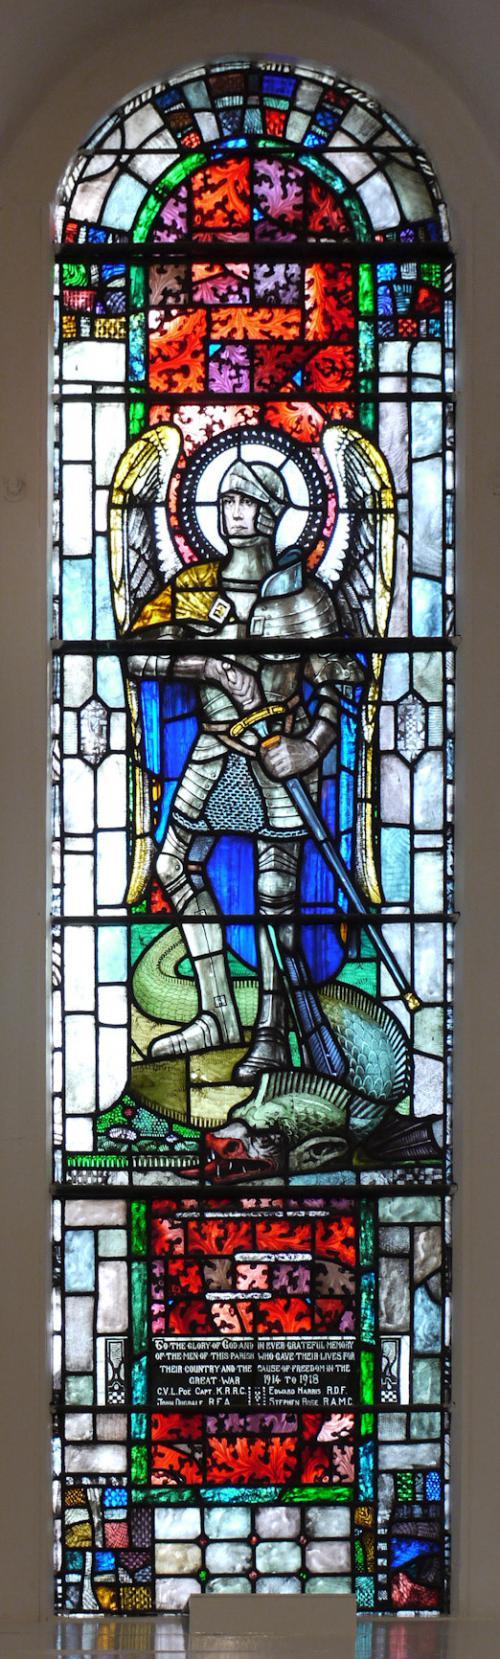 St. Pappan's Church Great War Memorial Window